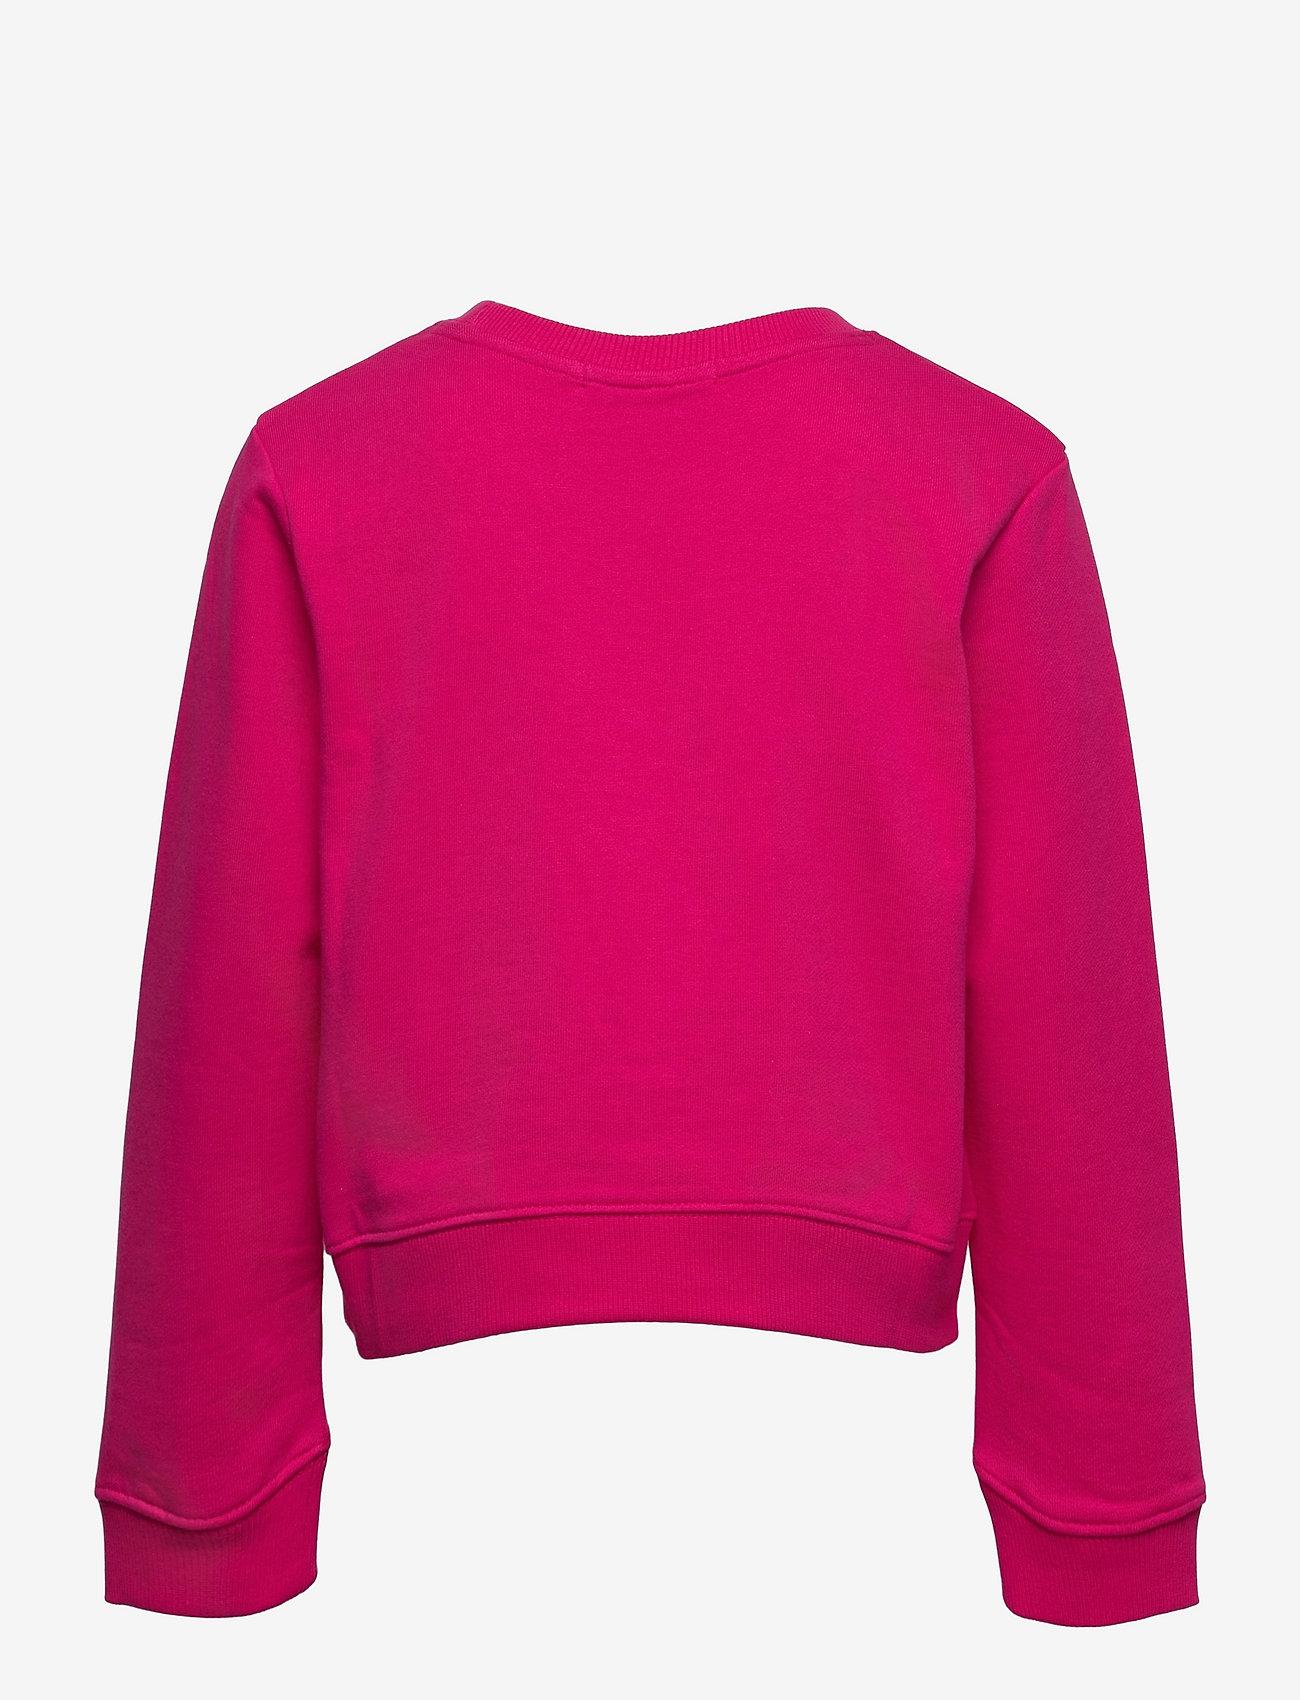 Calvin Klein - CK REPEAT FOIL SWEATSHIRT - sweatshirts - hot magenta - 1